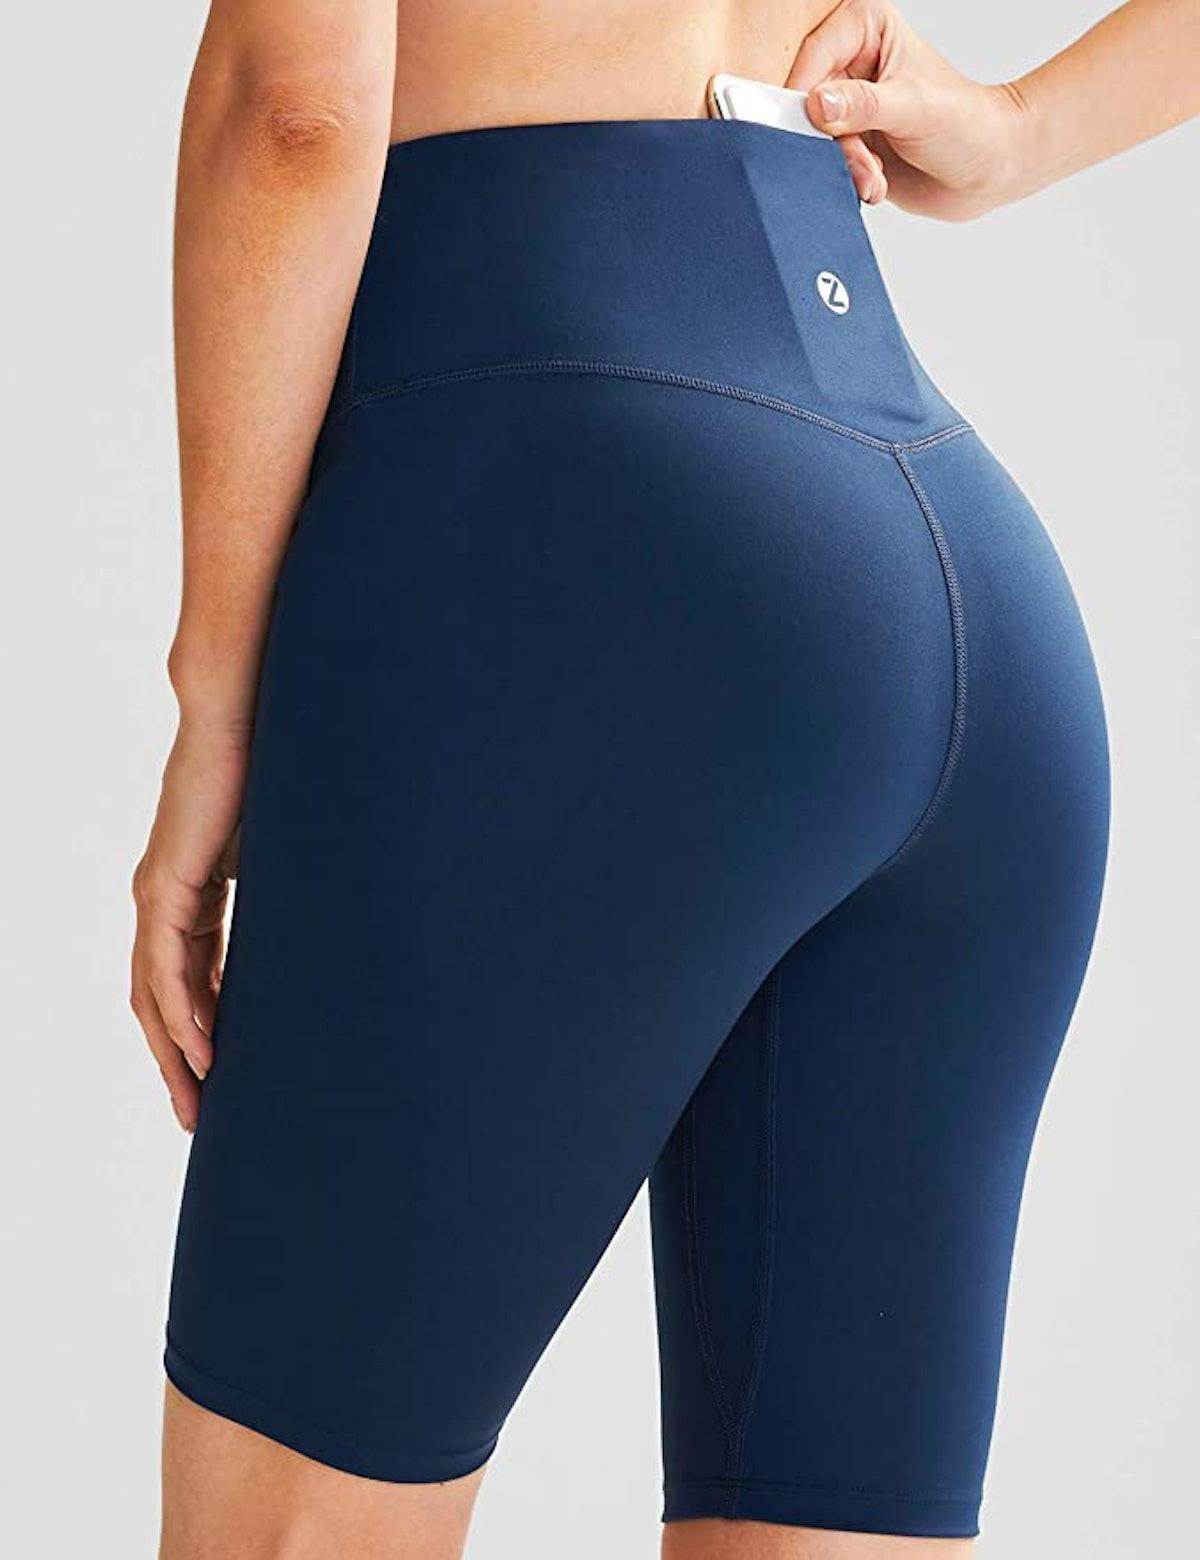 ZUTY Biker Shorts with 2 Hidden Pockets